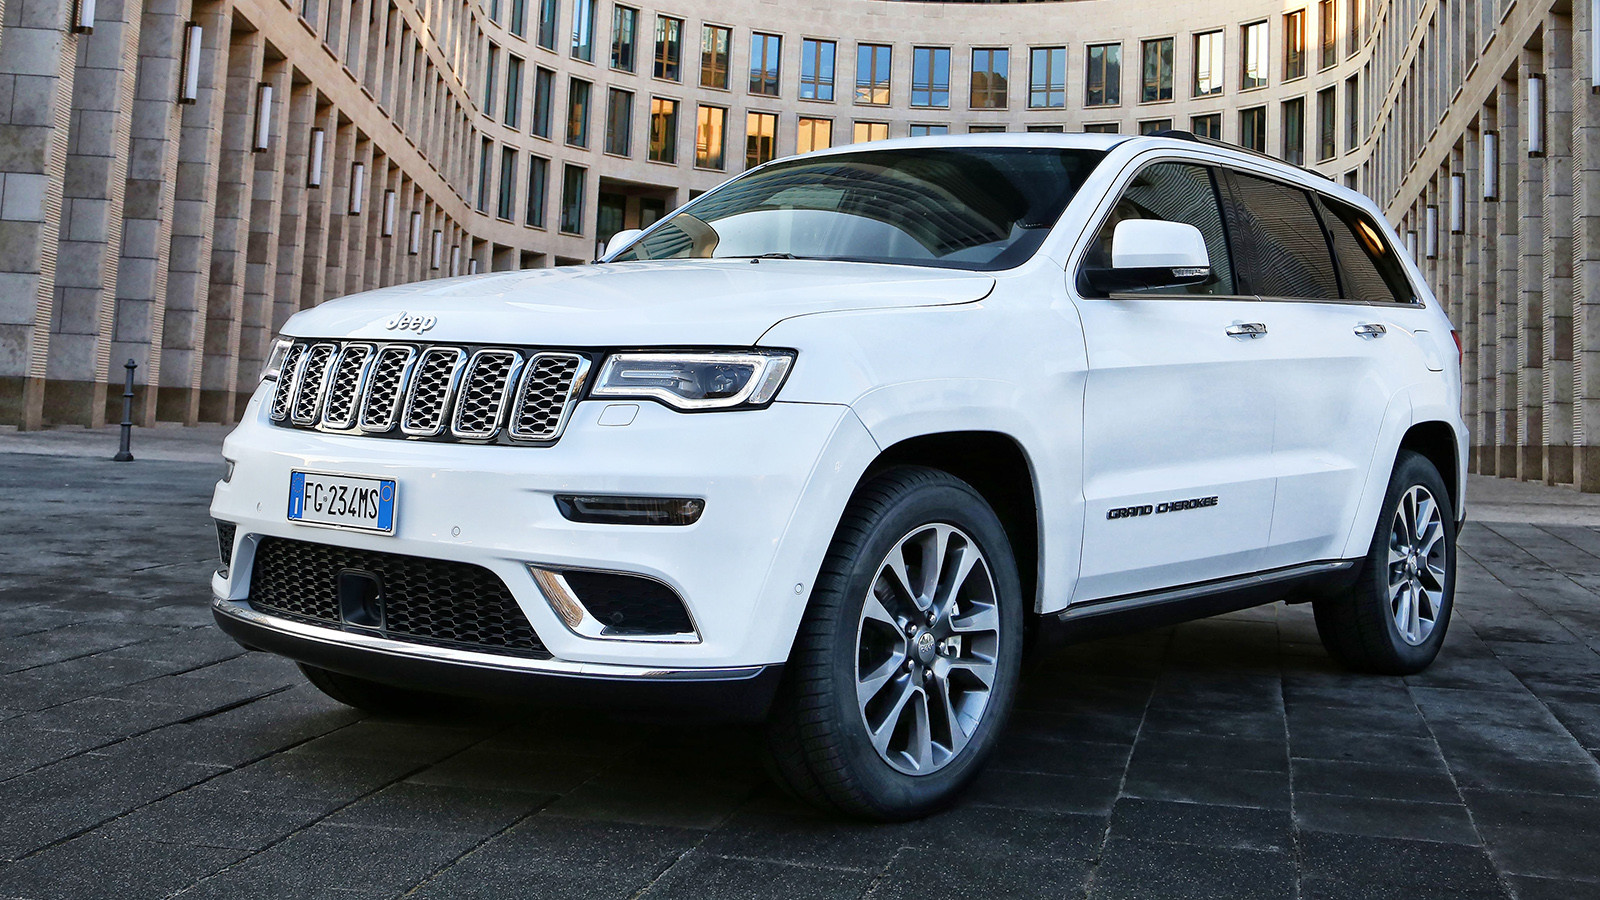 Jeep покажет вШанхае новый концепт-кар джипа